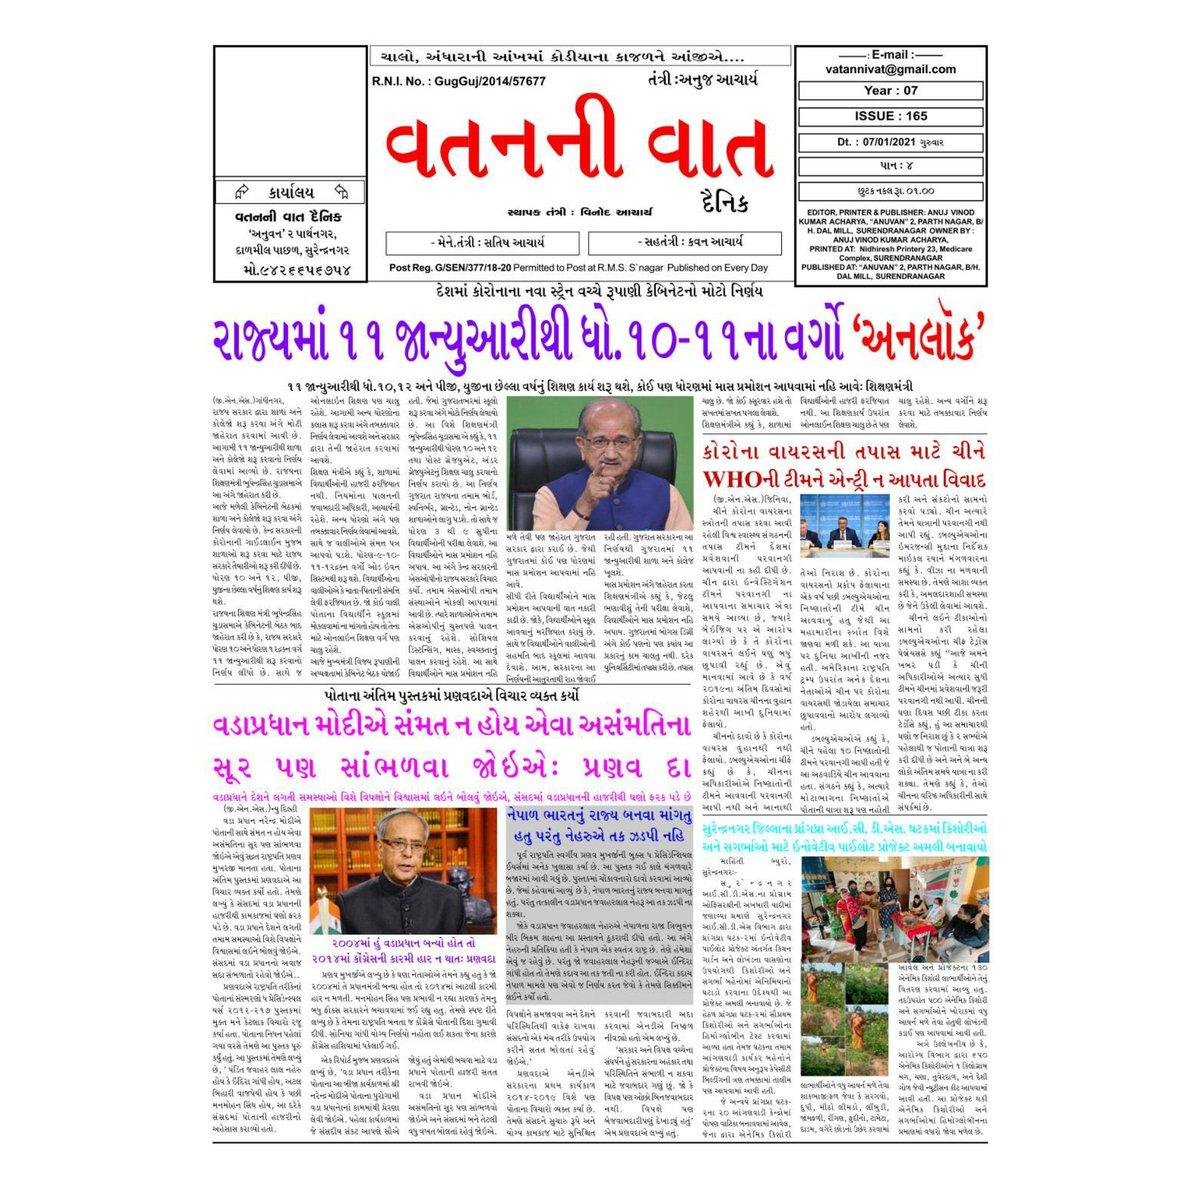 Today's Newspaper 07/01/2021 #vatannivatdaily 🗞️  Follow @vatannivat1  #vatannivat #વતનનીવાત #schools #schoolsreopen #college #coronavirus #pranavda #kanikadhillon #himanshusharma #UrmilaMatondkar #KanganaRanaut #NoraFatehi #nehapandse #siddharthmalhotra #kiaraadvani #JackMa